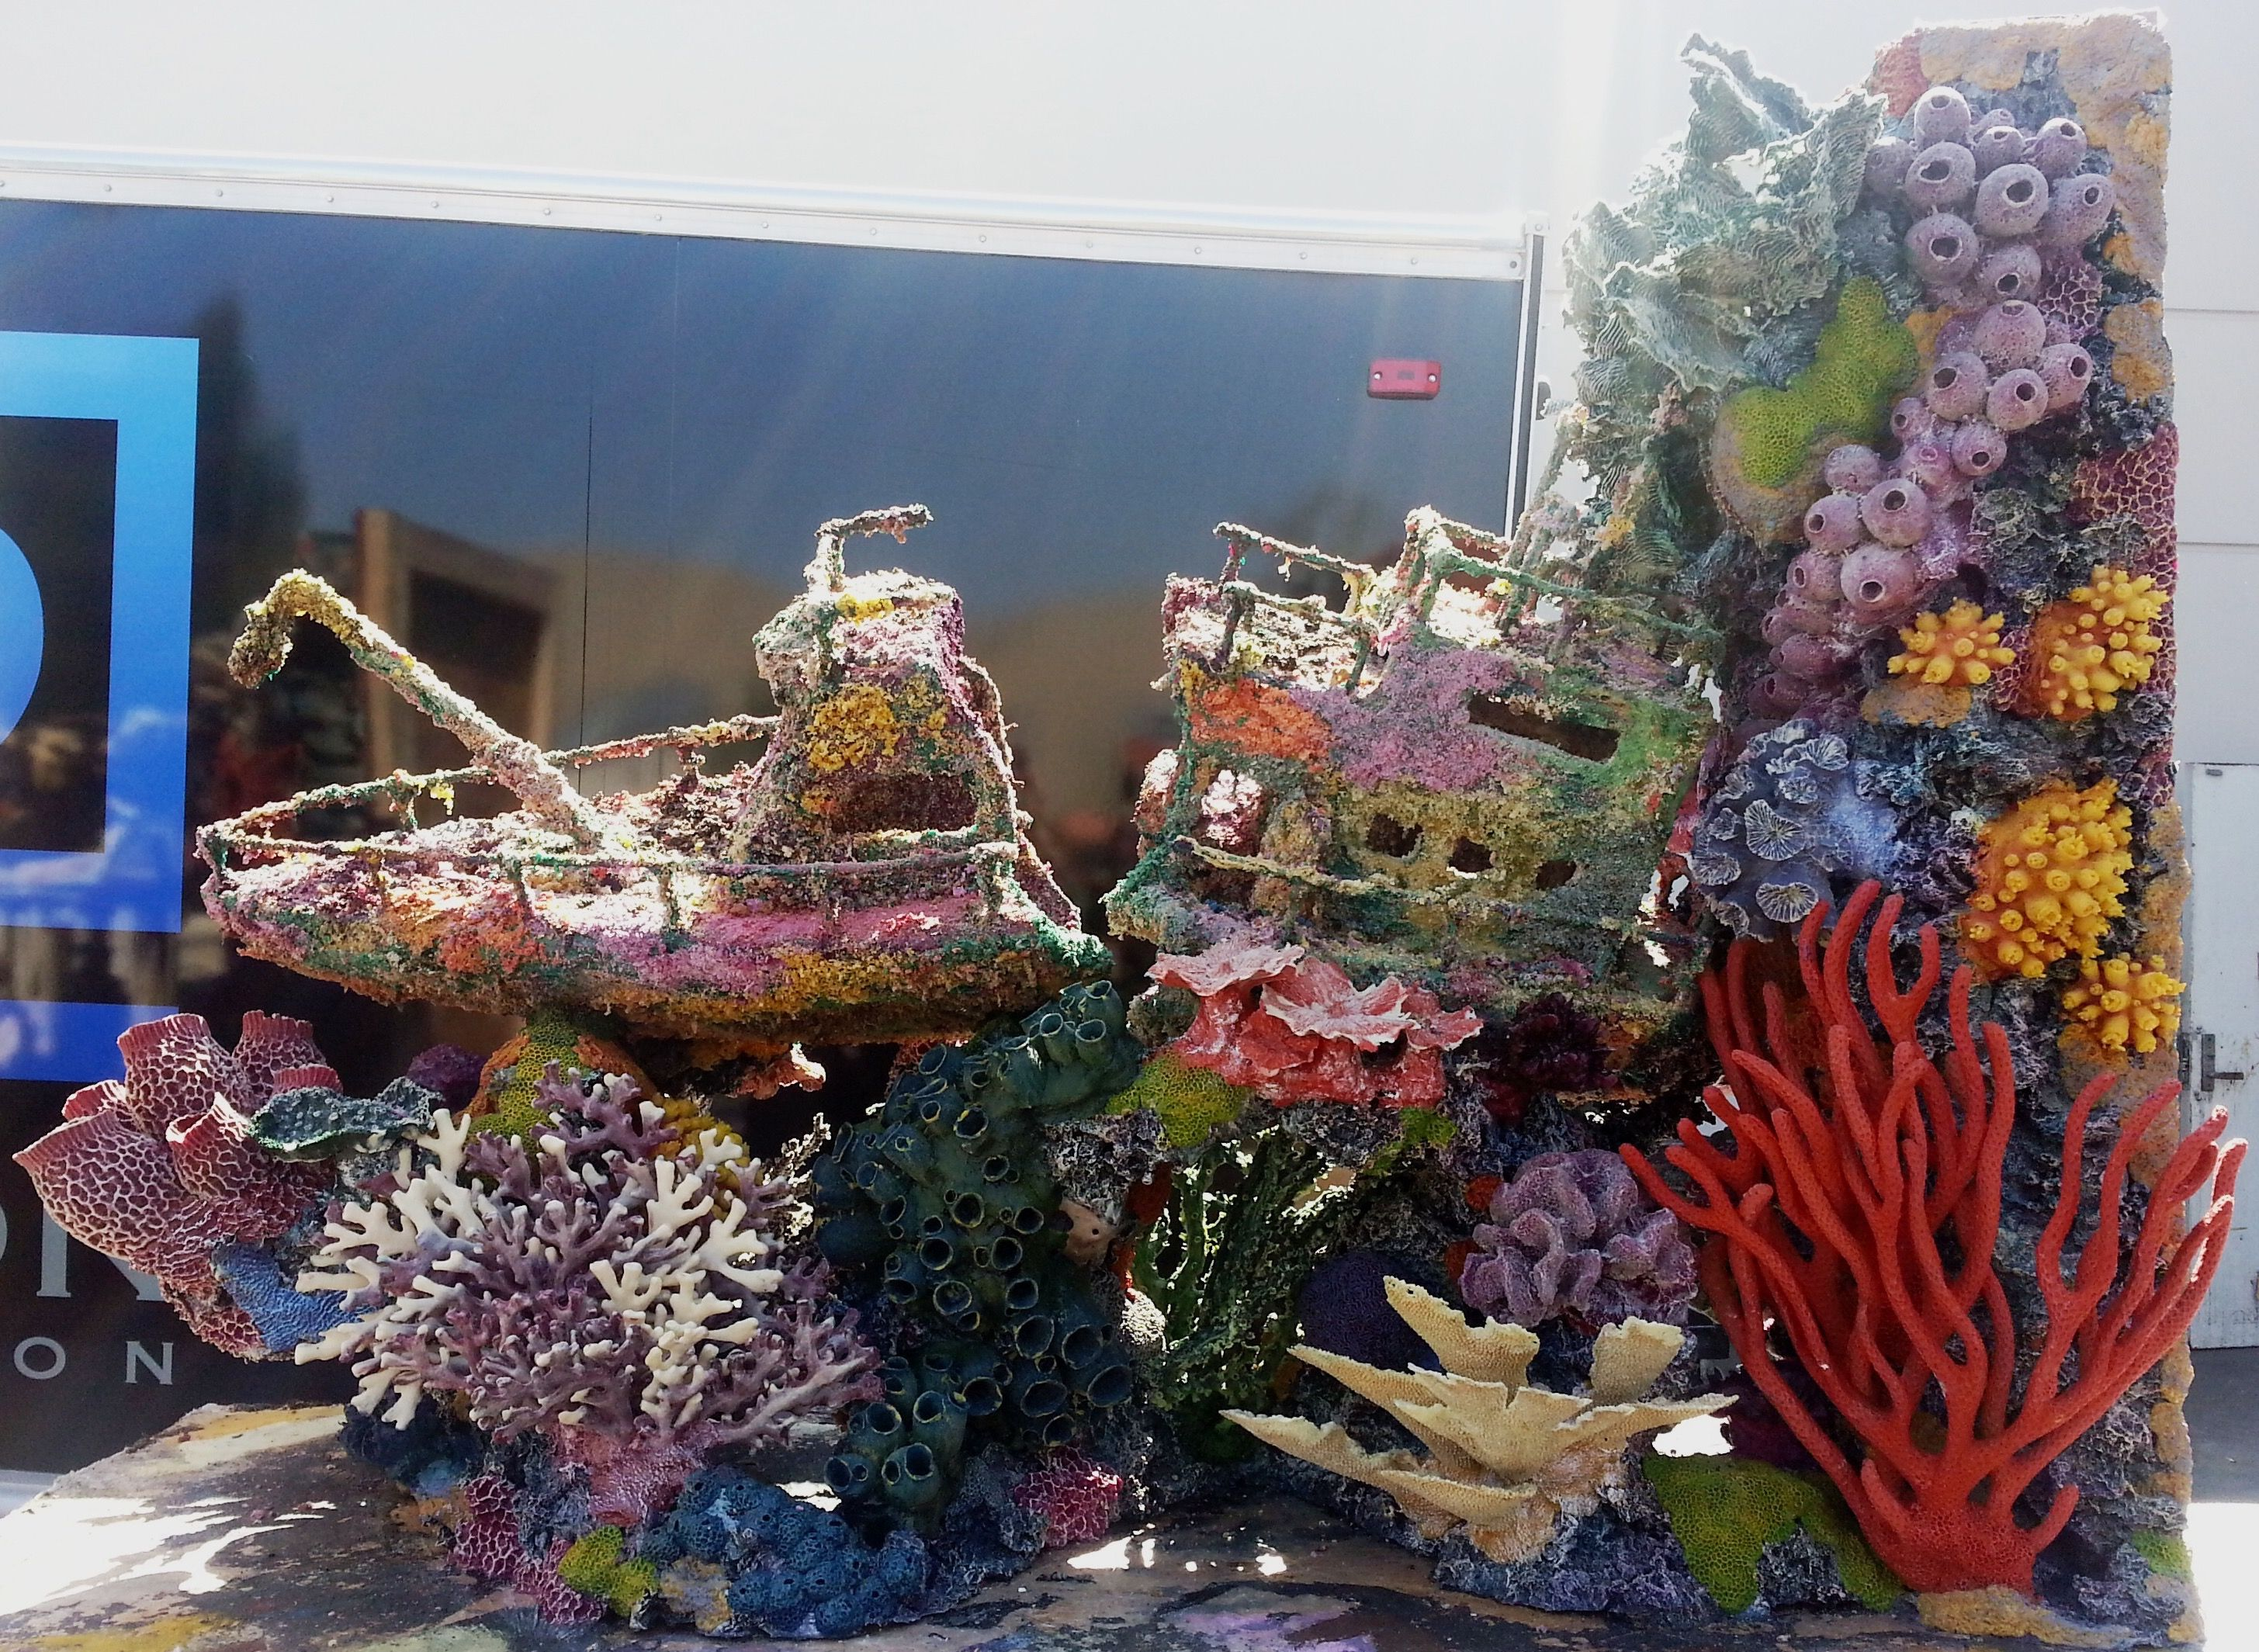 Holiday decor image by poseidon Construction on shipwreck ...